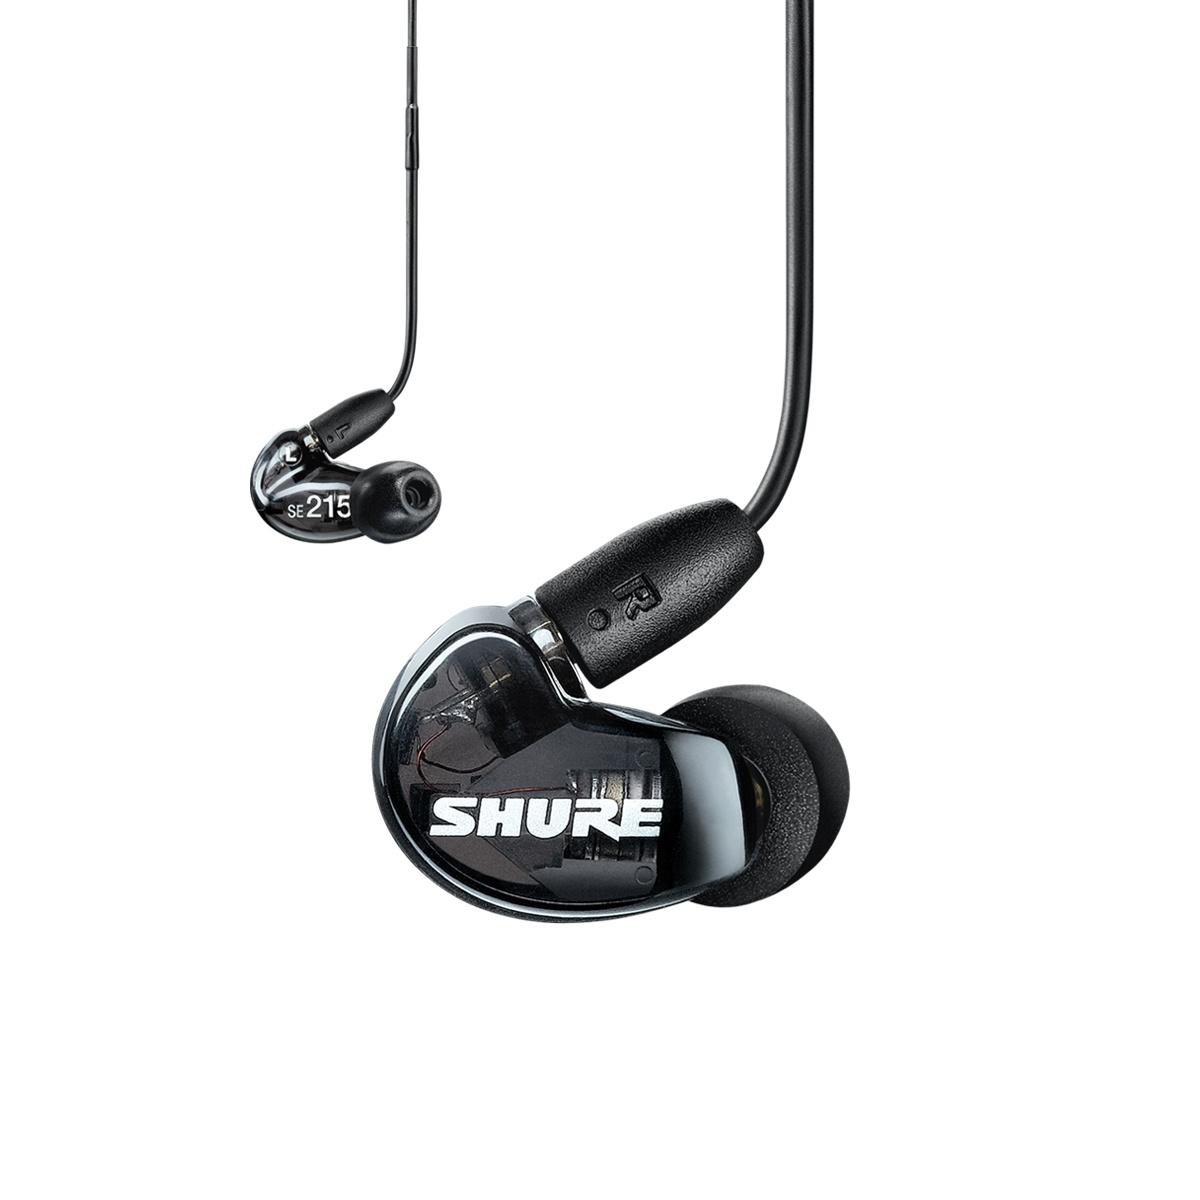 Shure AONIC 215 Sound Isolating Earphones (Black)